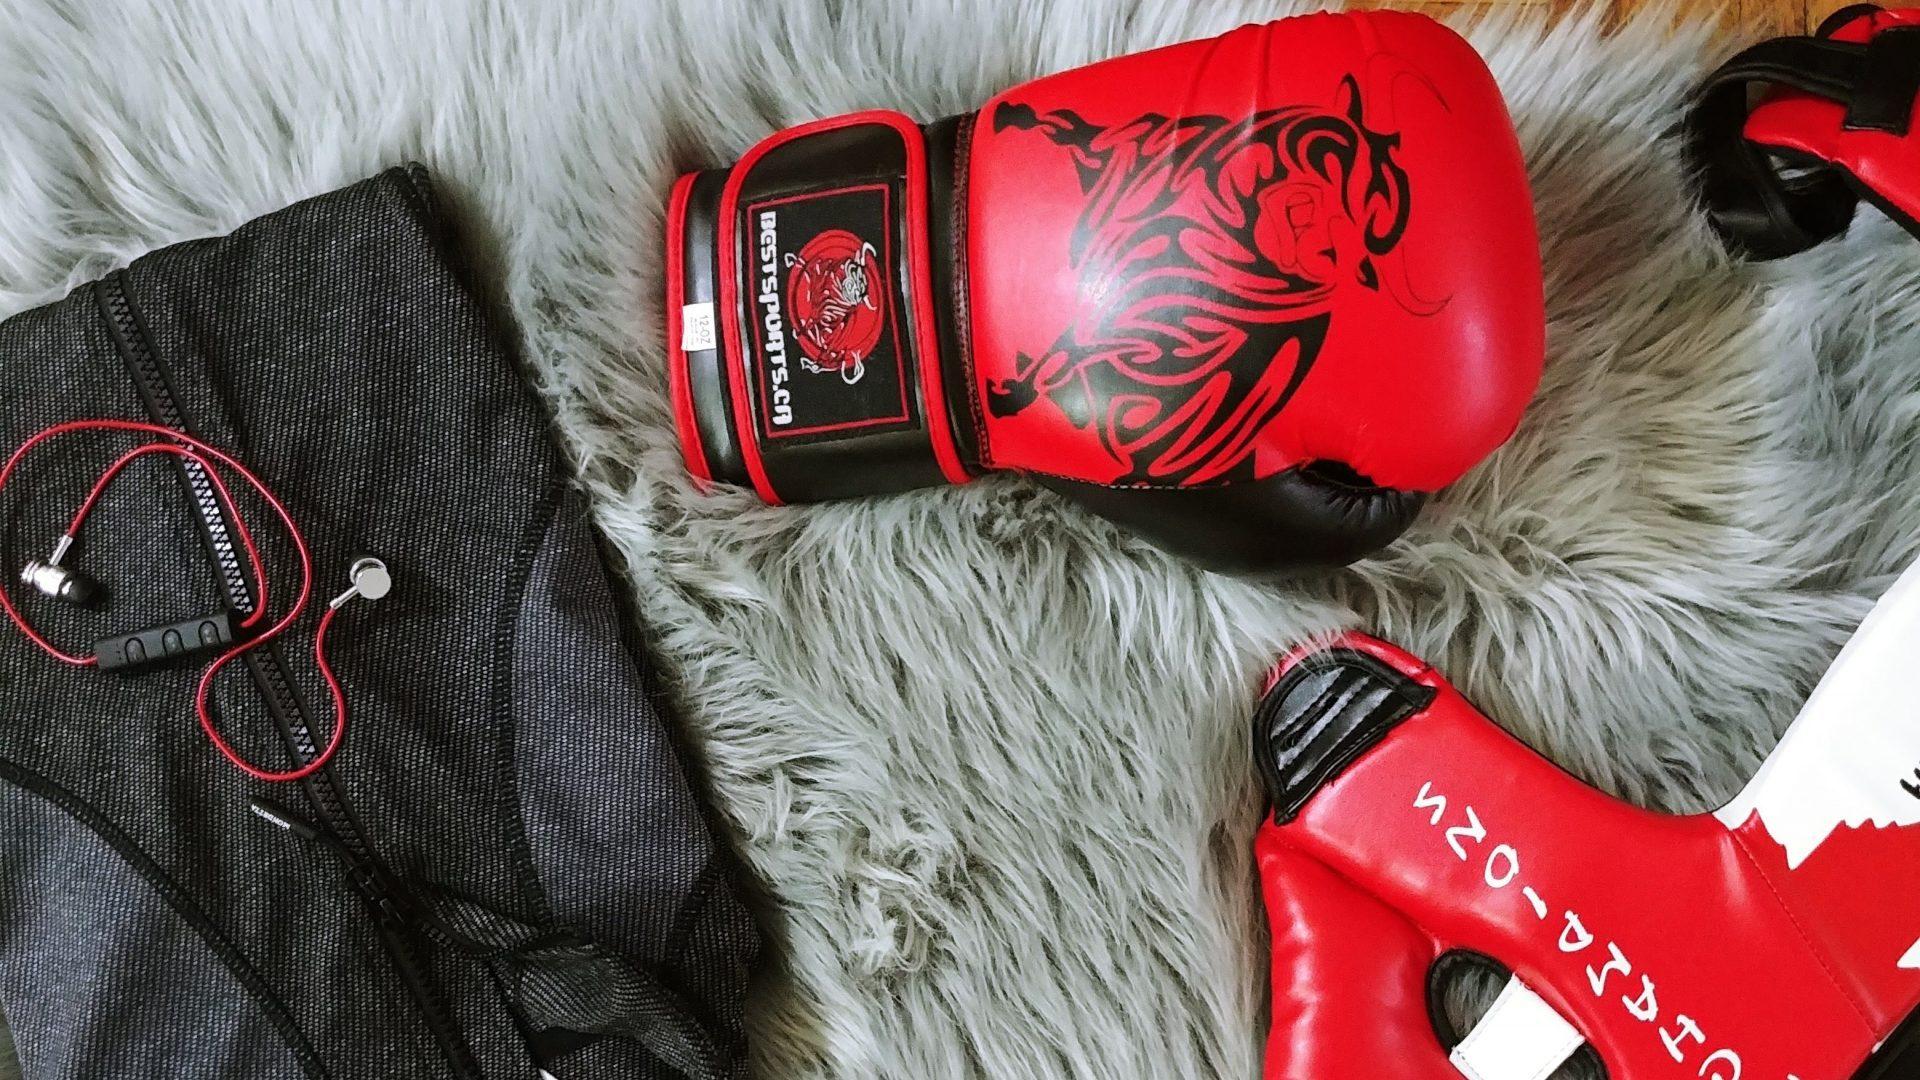 Personal bokstraining